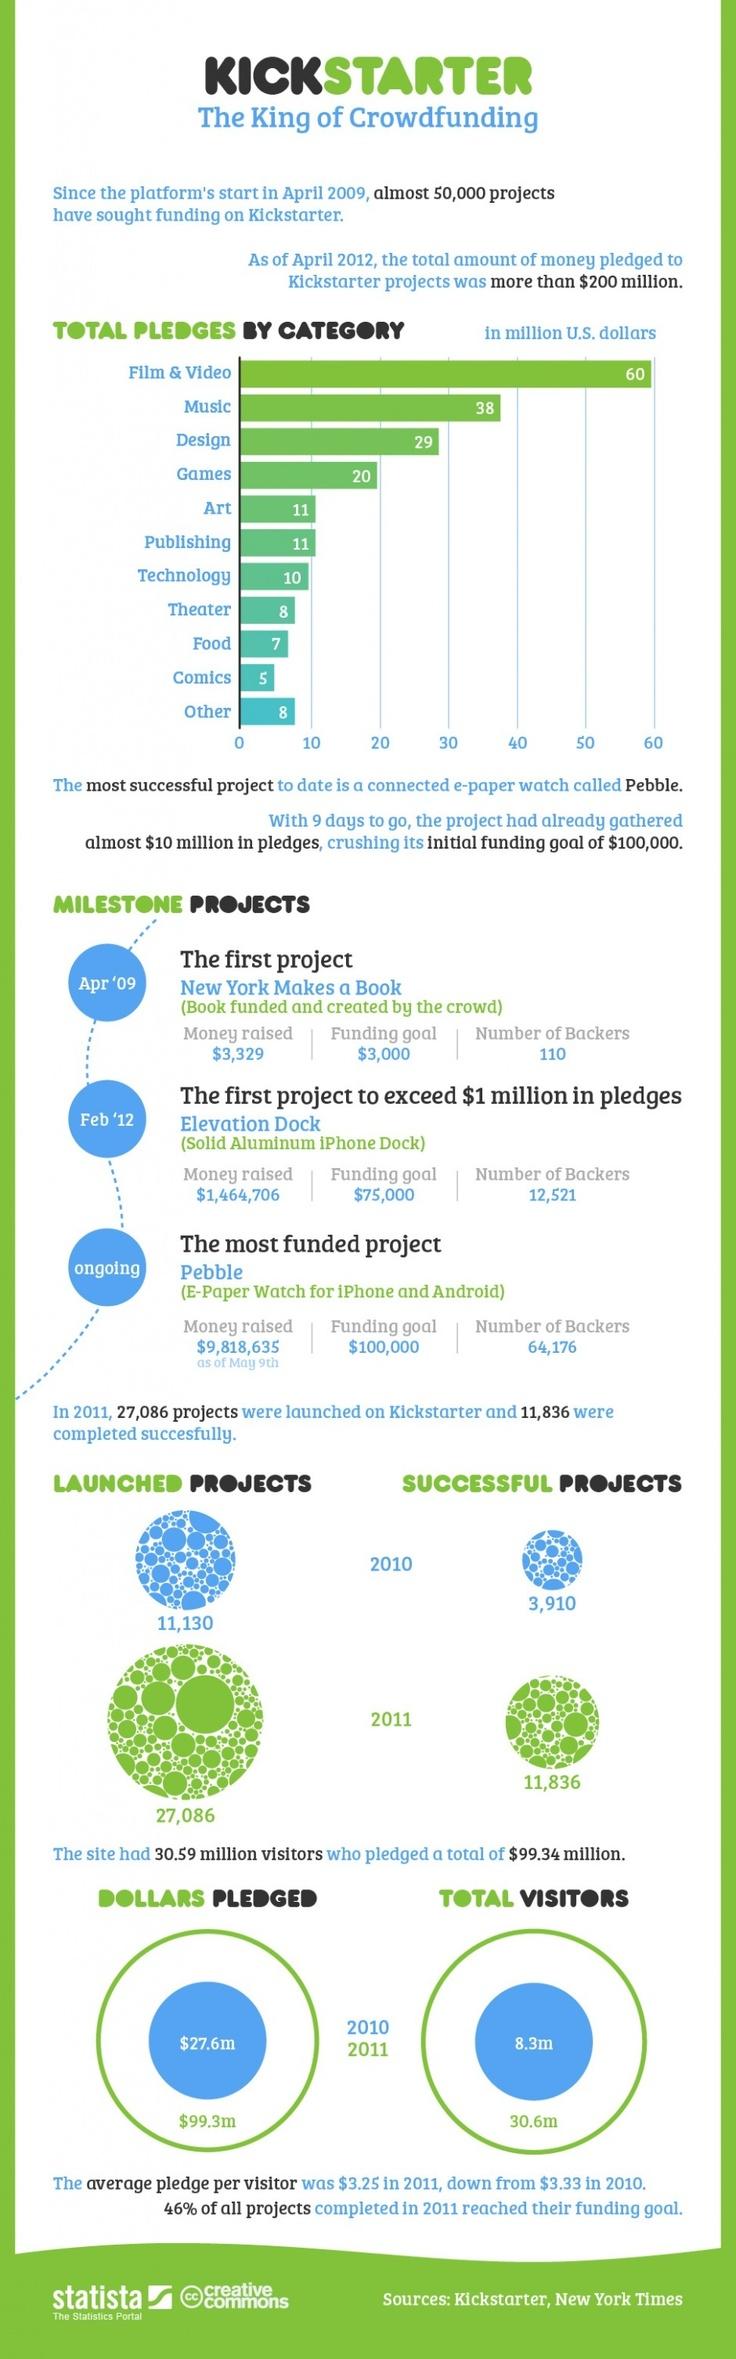 Kickstarter: The King of Crowdfunding –Infographic